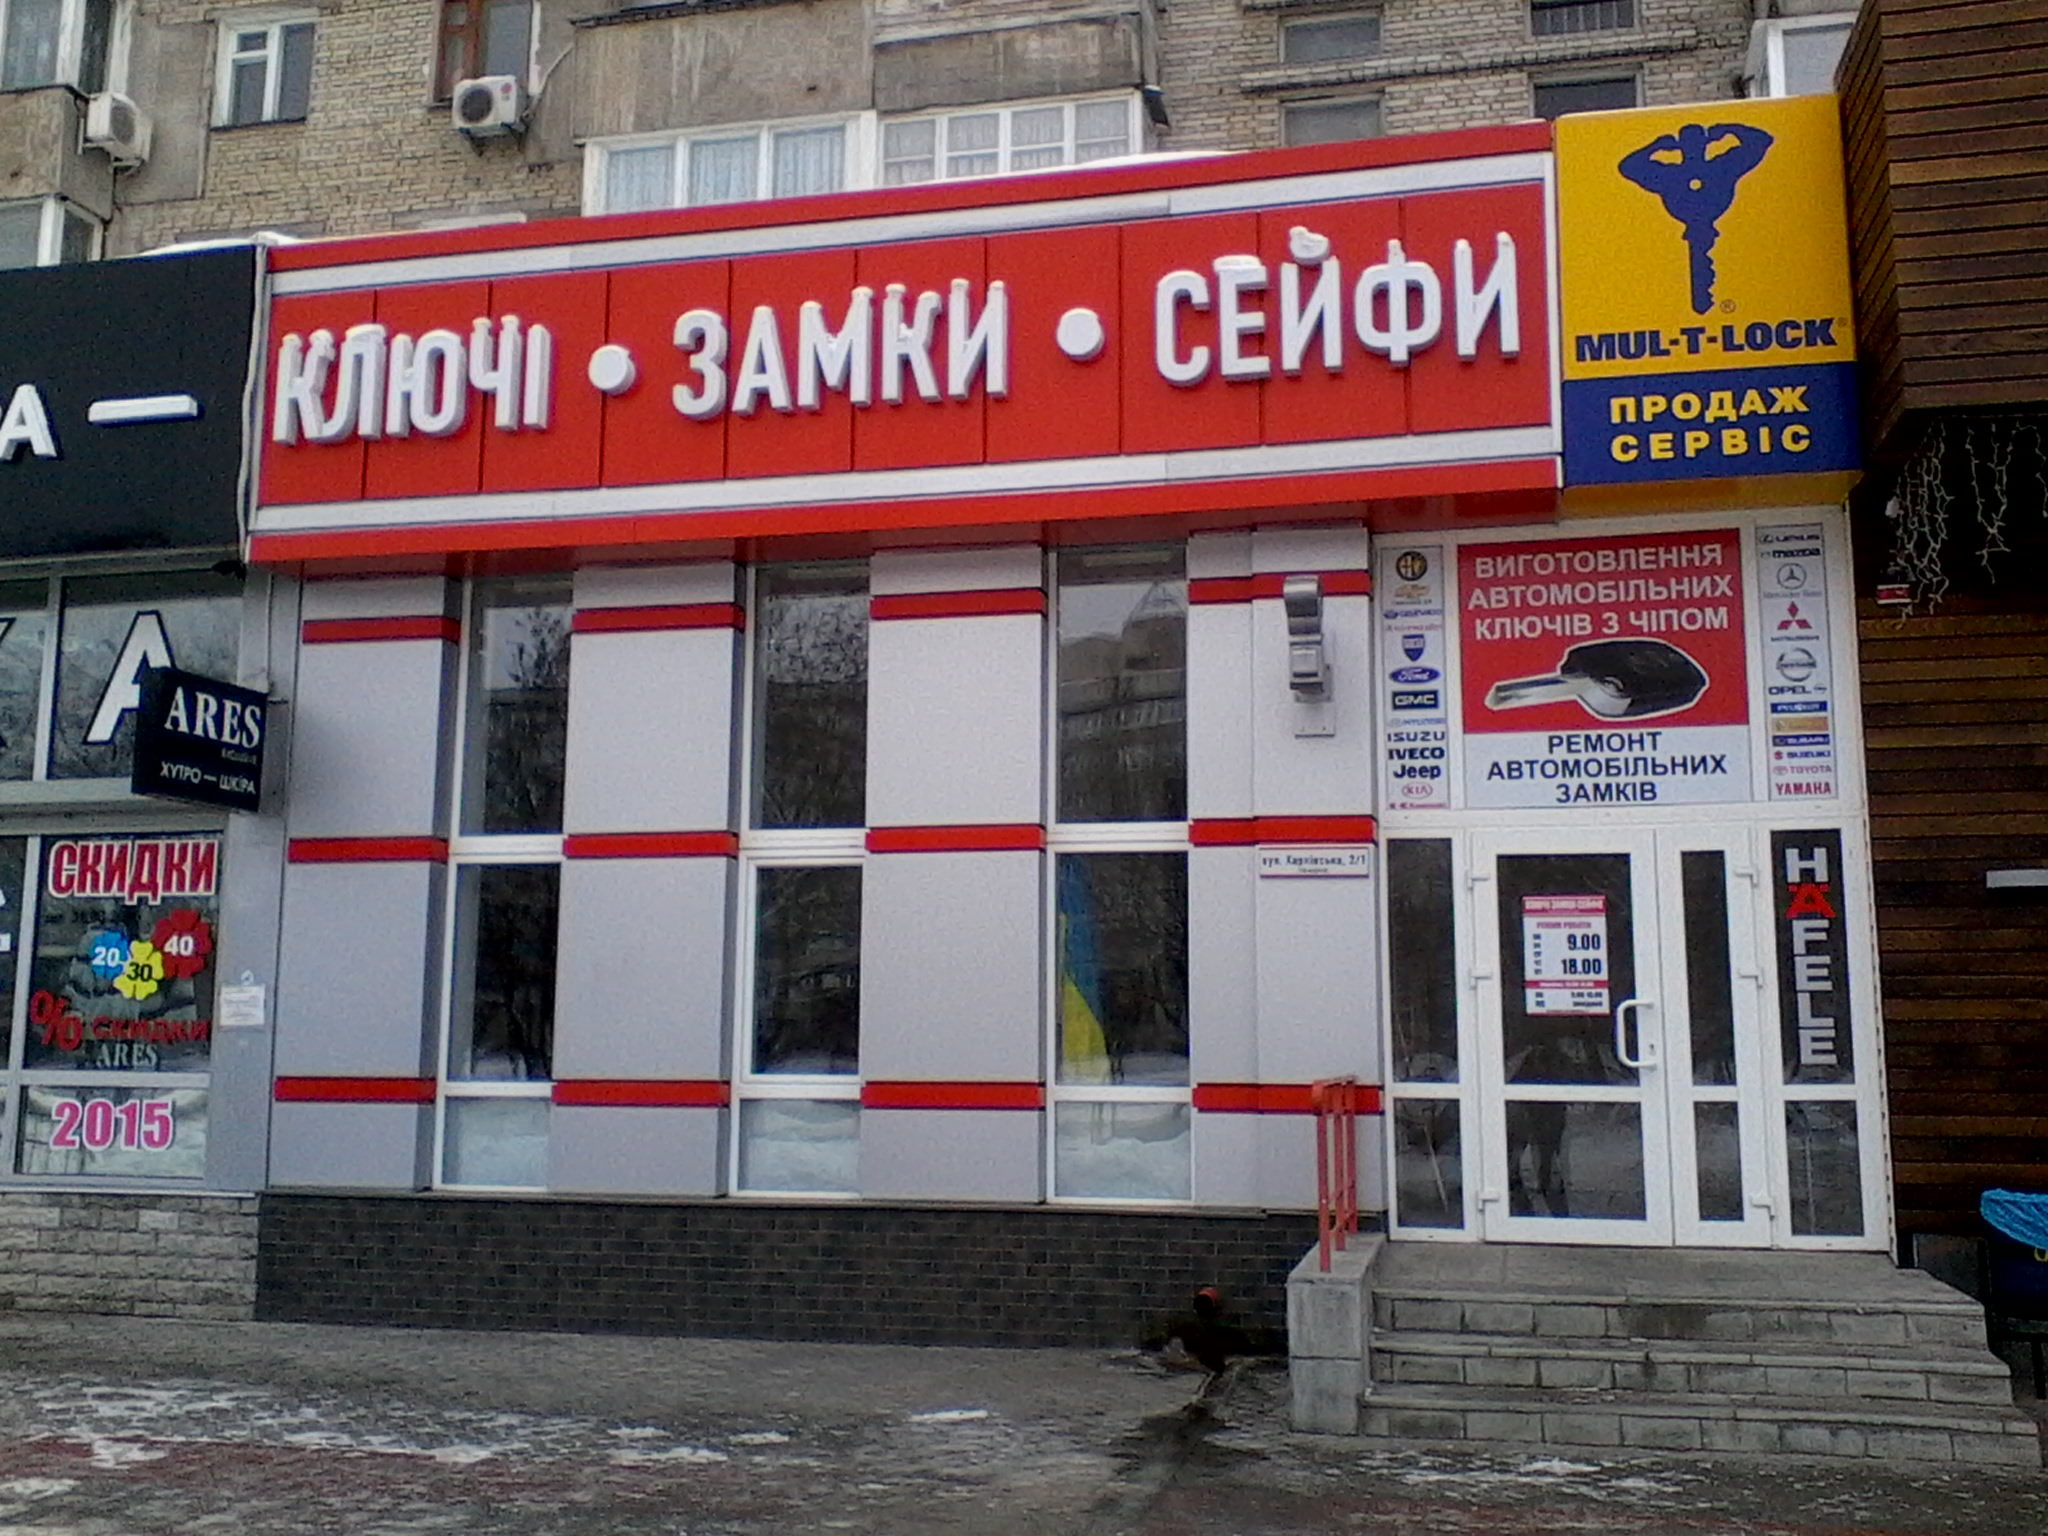 Изображение стороннего сайта - https://www.auto.sumy.ua/phpbb/files/440_e3c10a1a5b65415756fdacc22ca61ef6.jpg